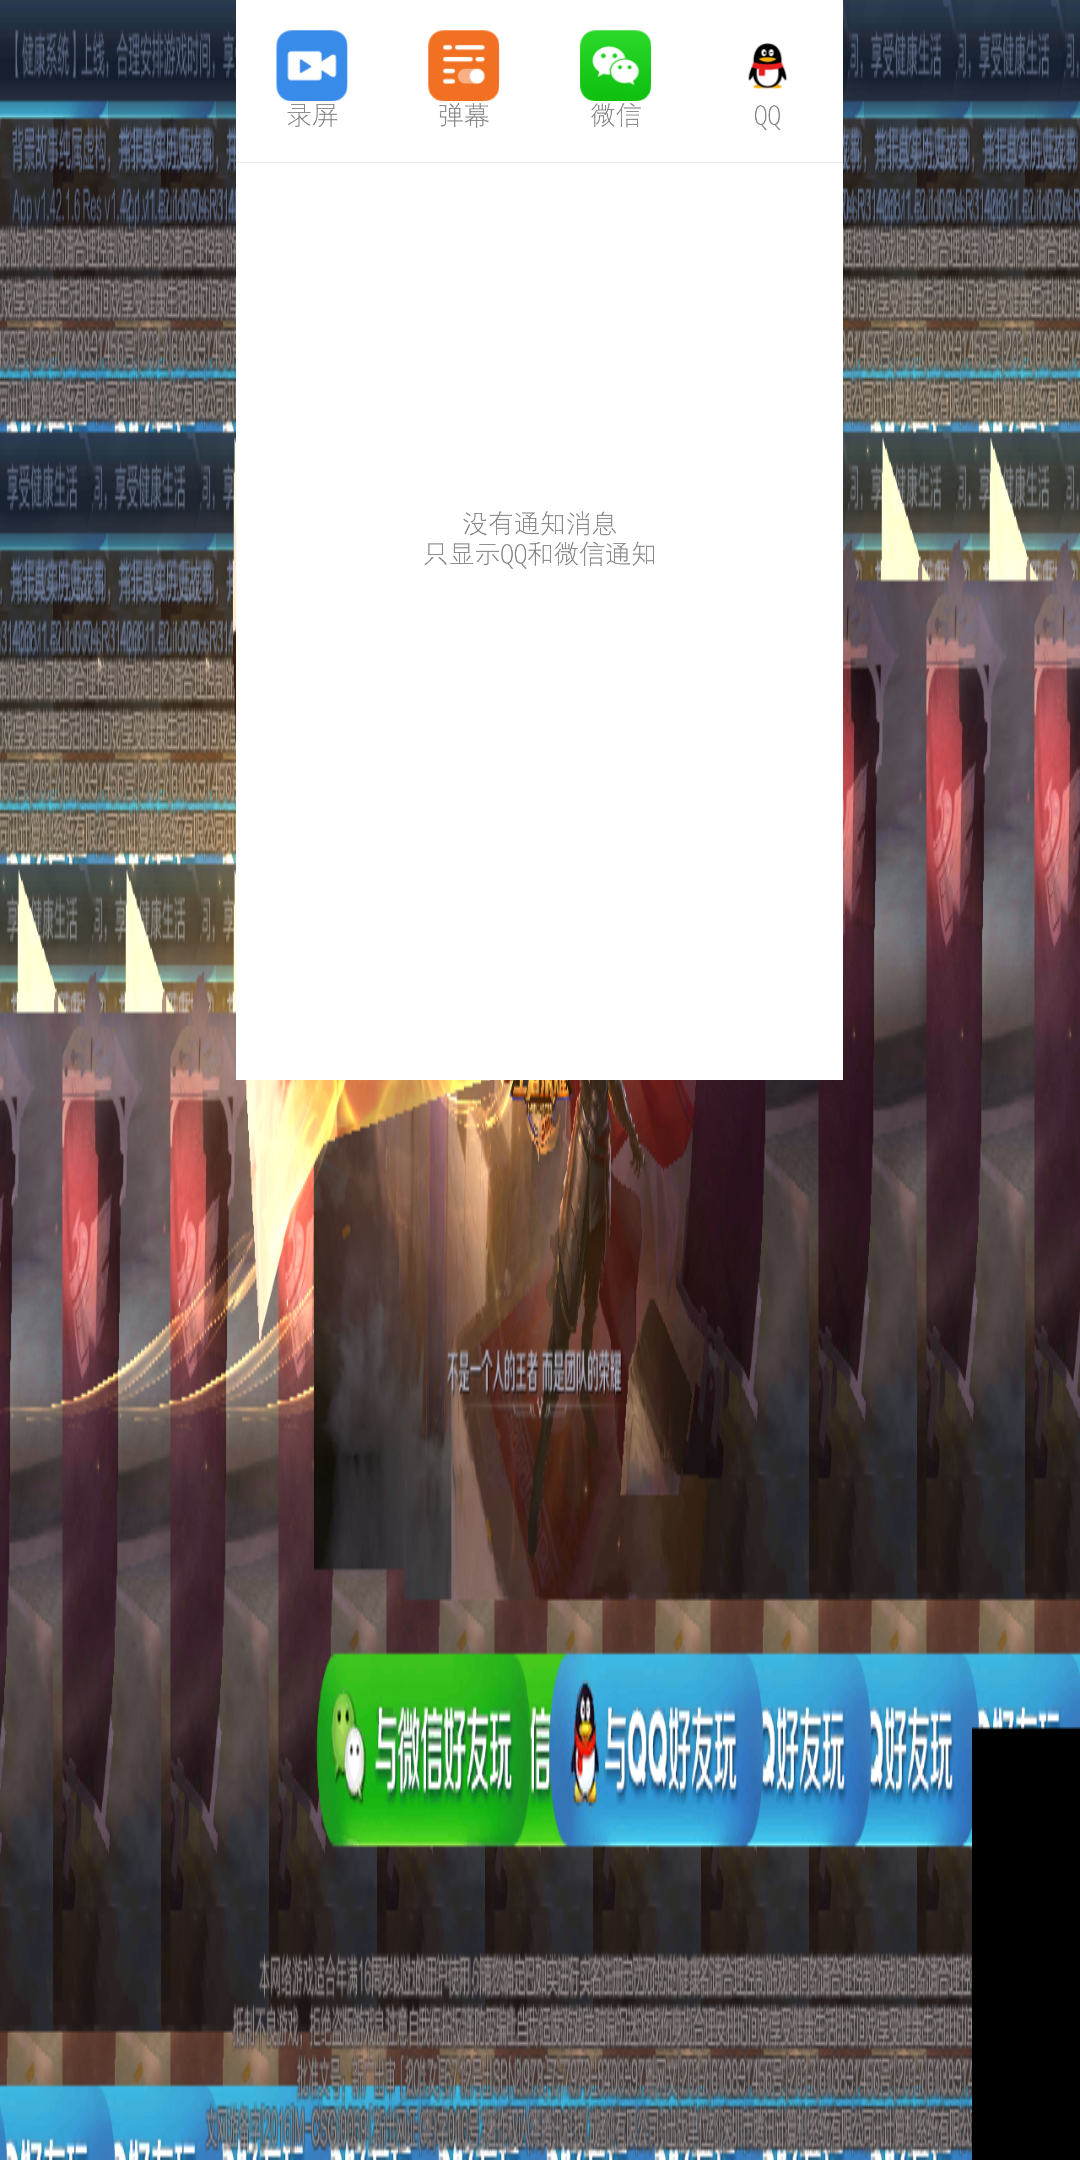 Screenshot_2018-12-02-10-03-31.png